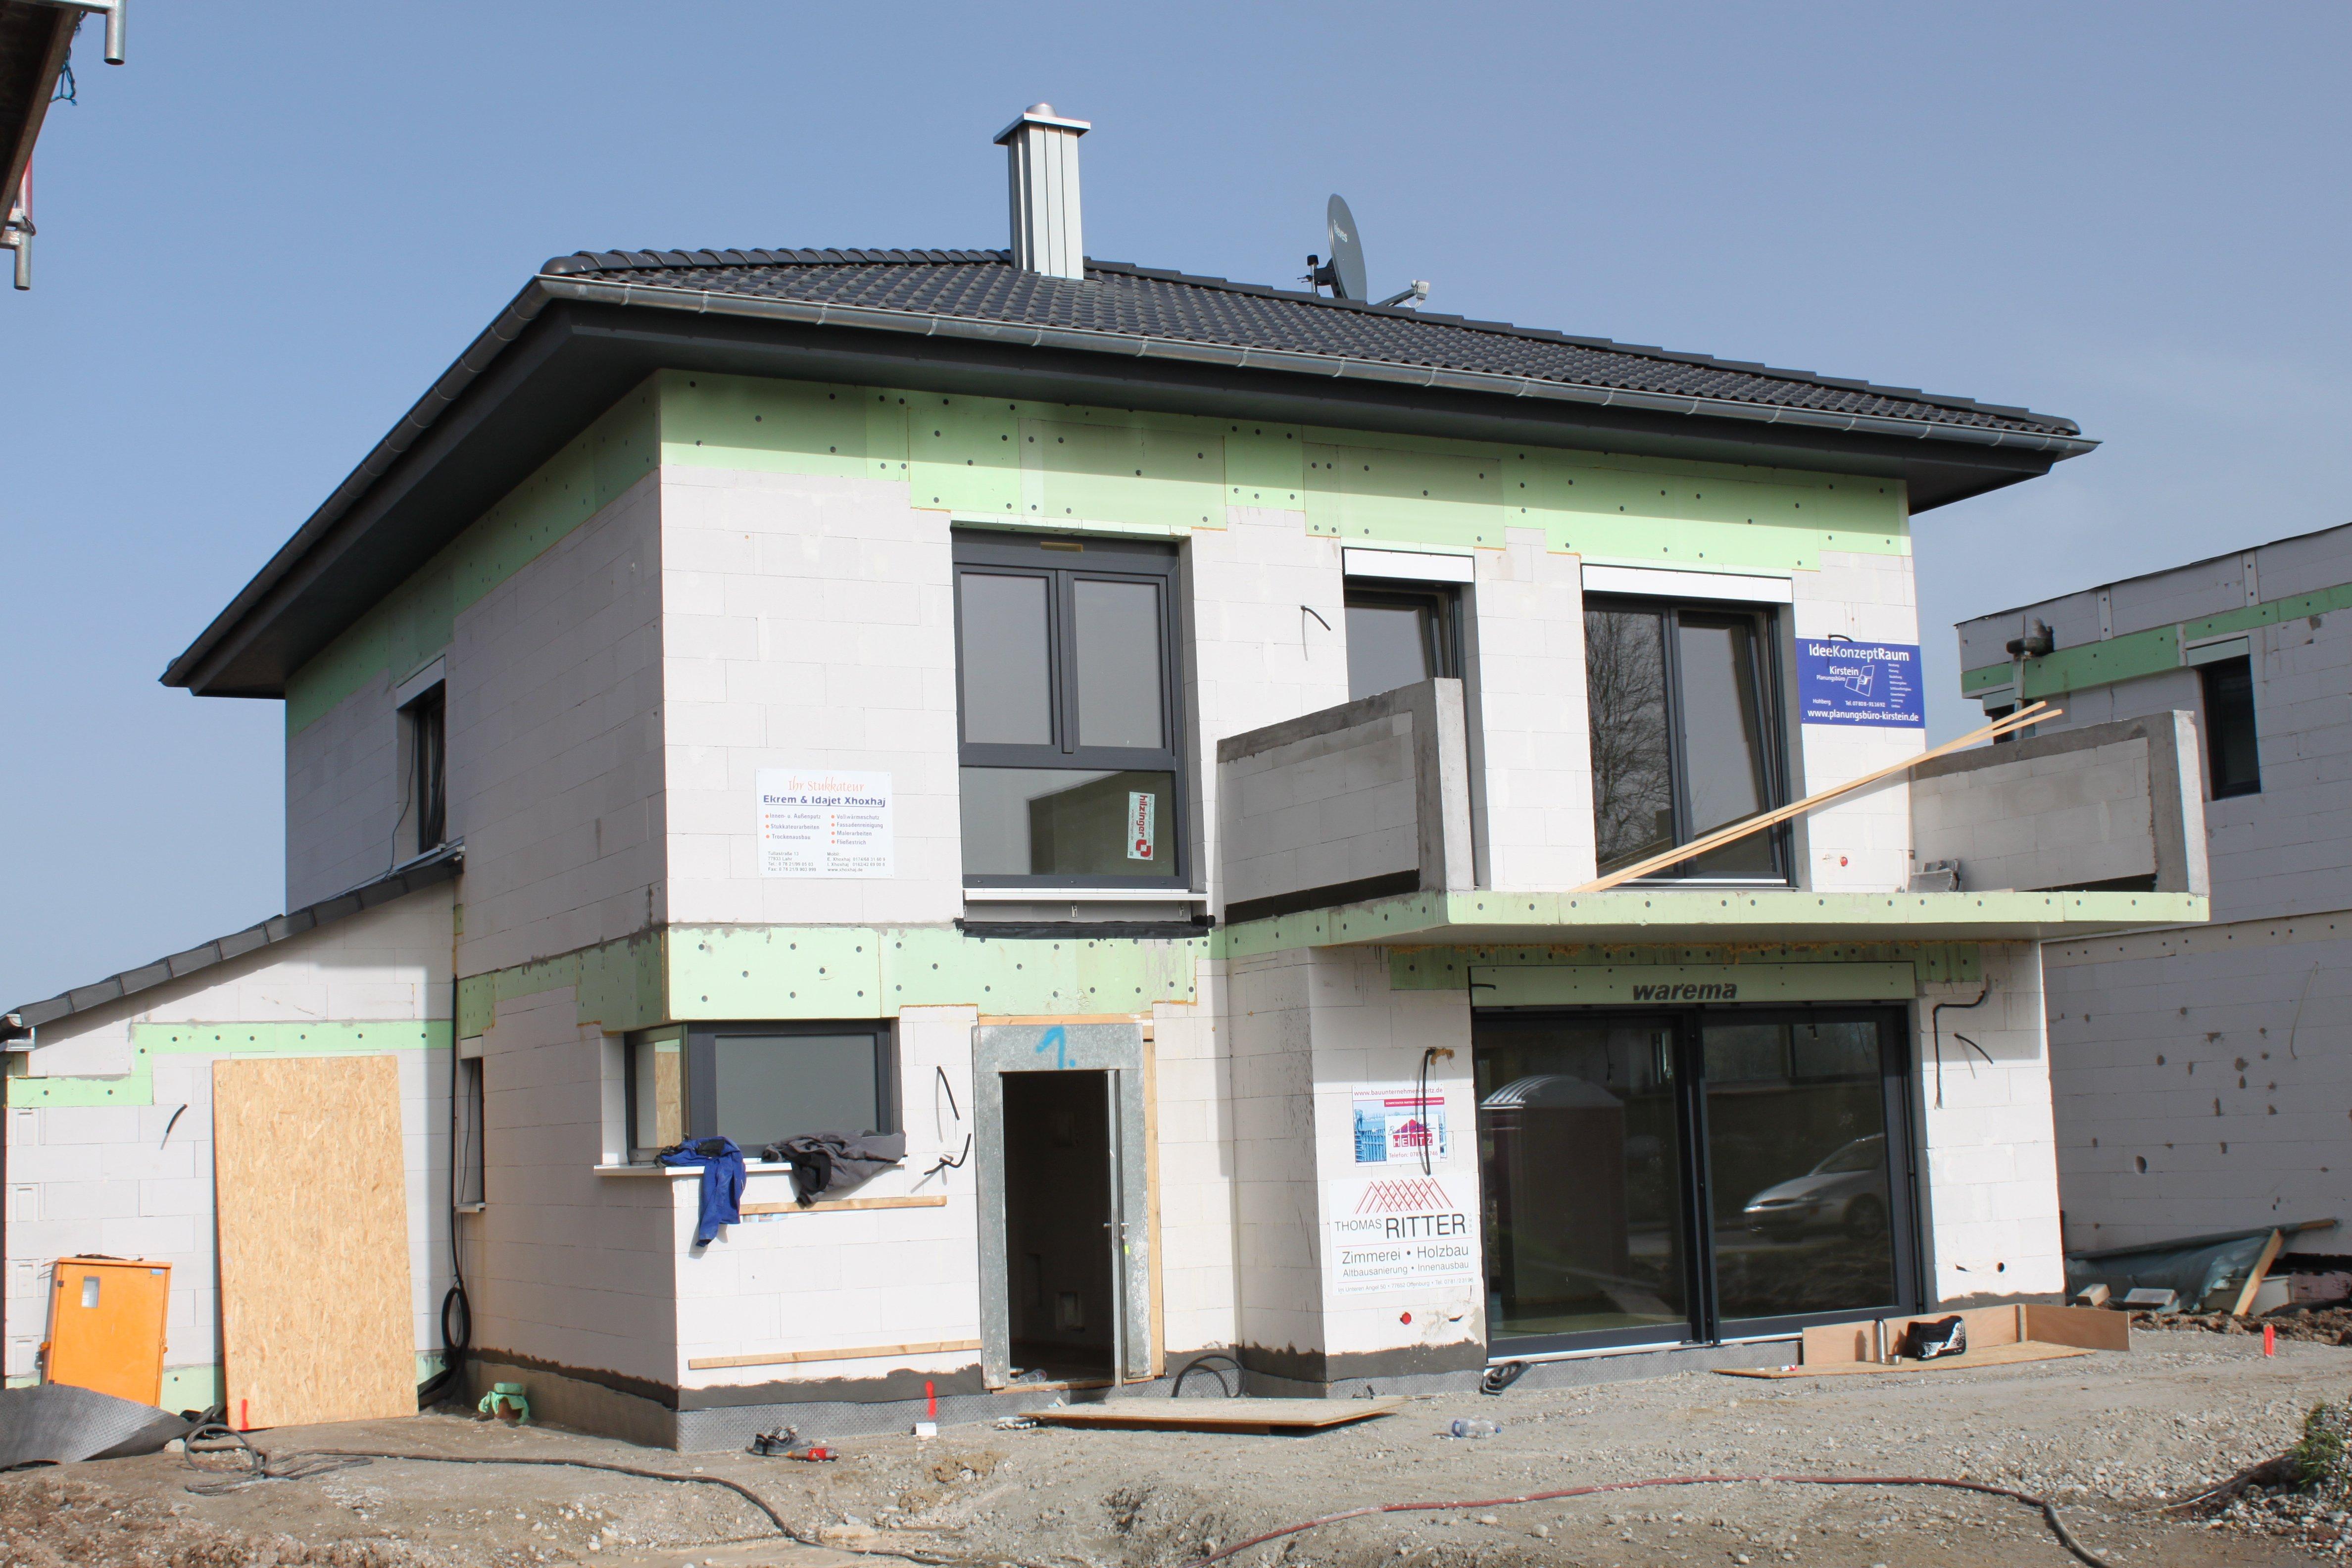 Bauunternehmen Offenburg bauunternehmen offenburg hausdesigns co